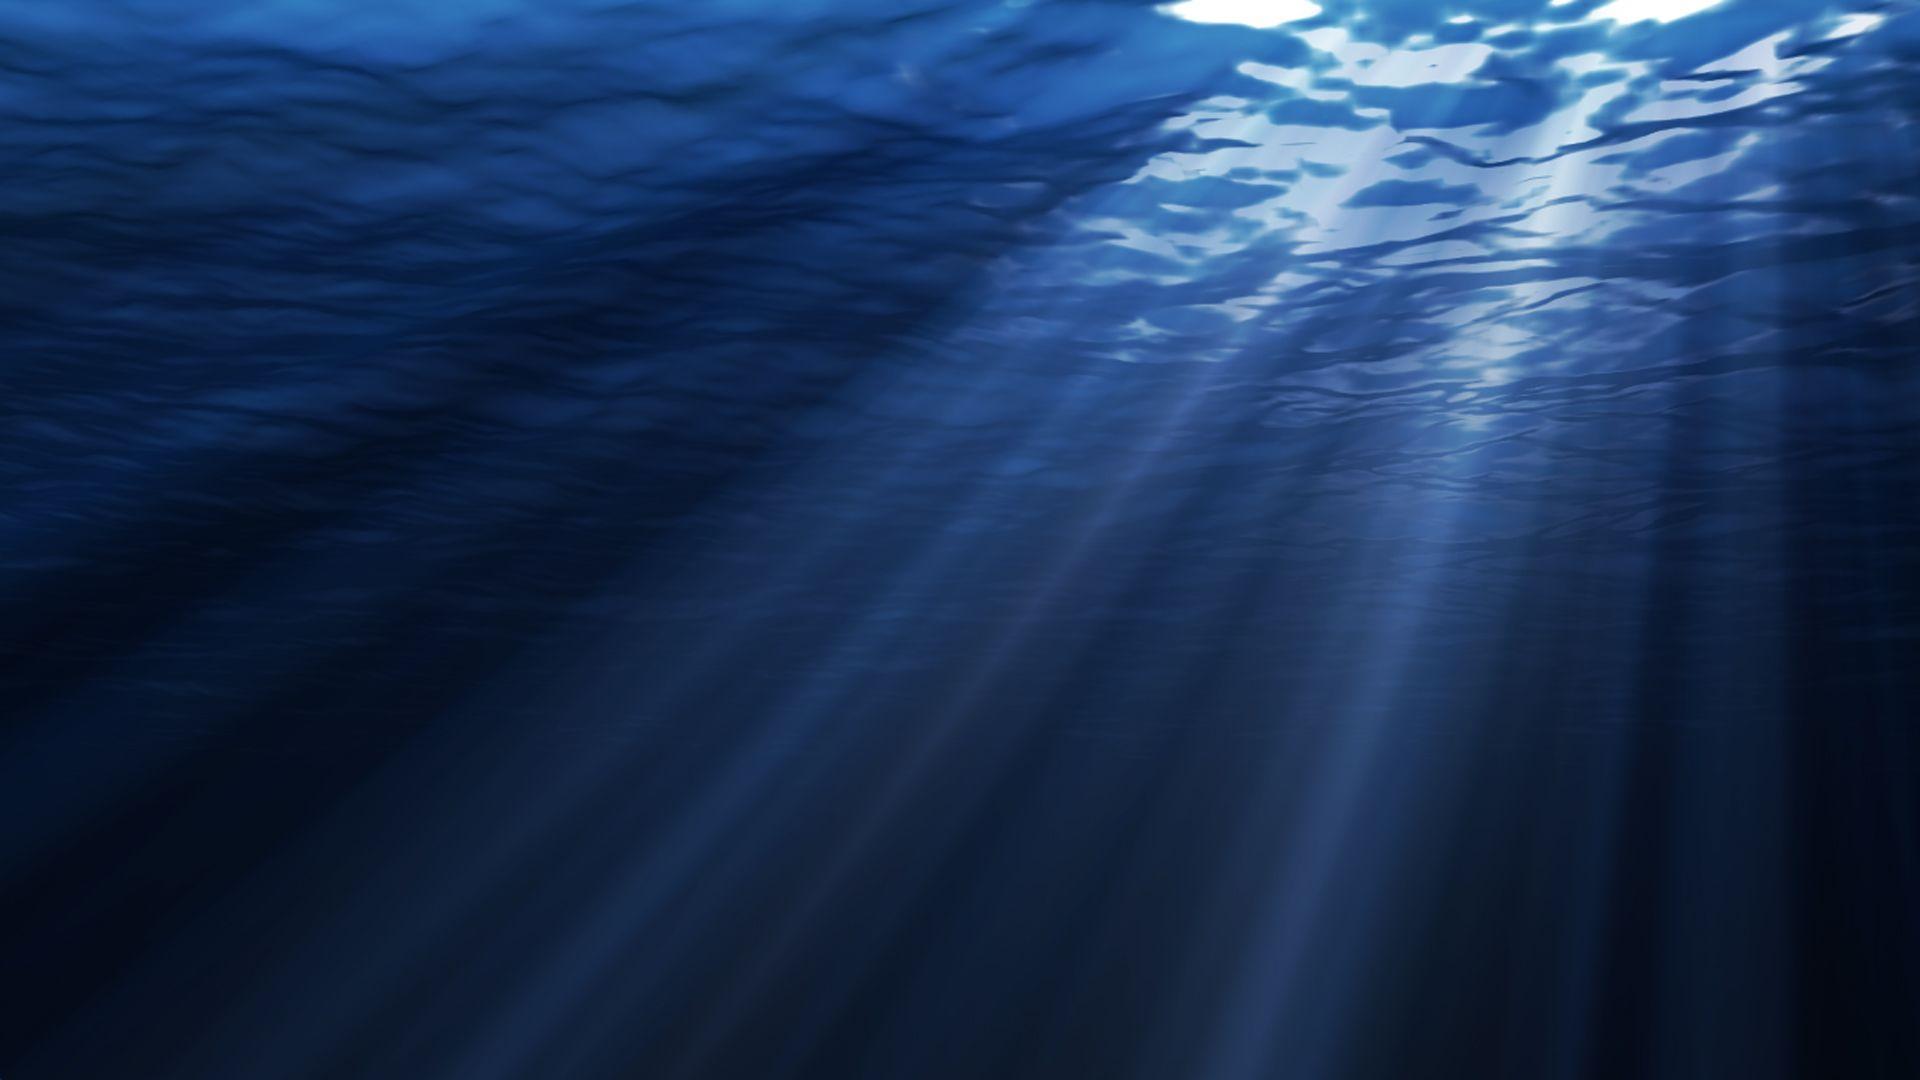 Underwater Backgrounds Wallpaper Cave